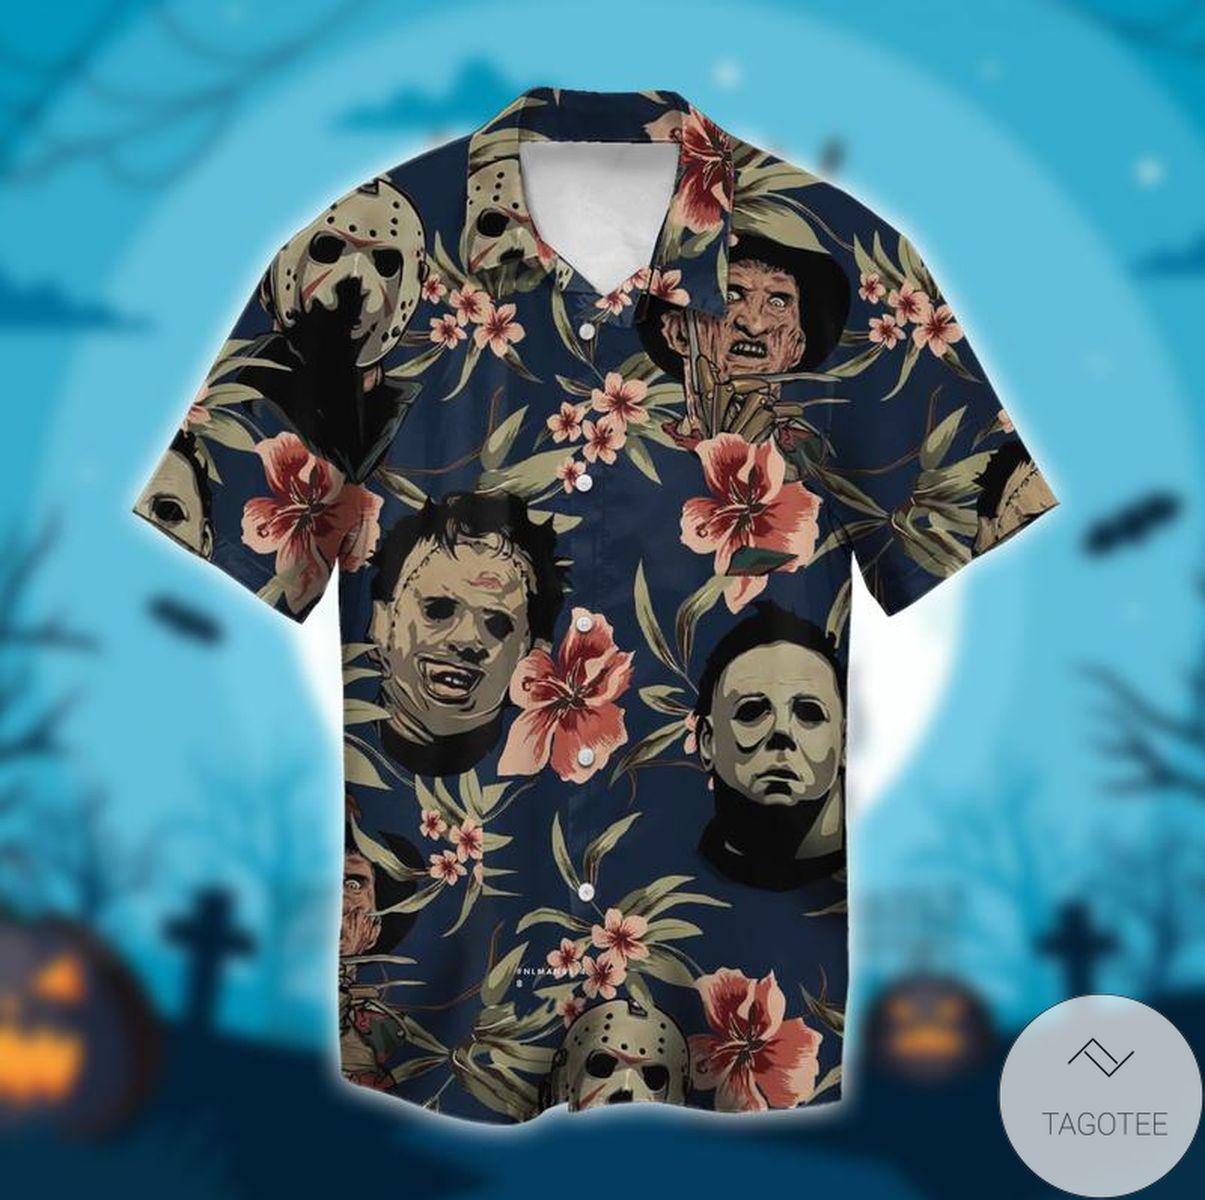 Mother's Day Gift Halloween Michael Myers Jason Voorhees Freddy Krueger Leatherface Hawaiian Shirt, Beach Shorts